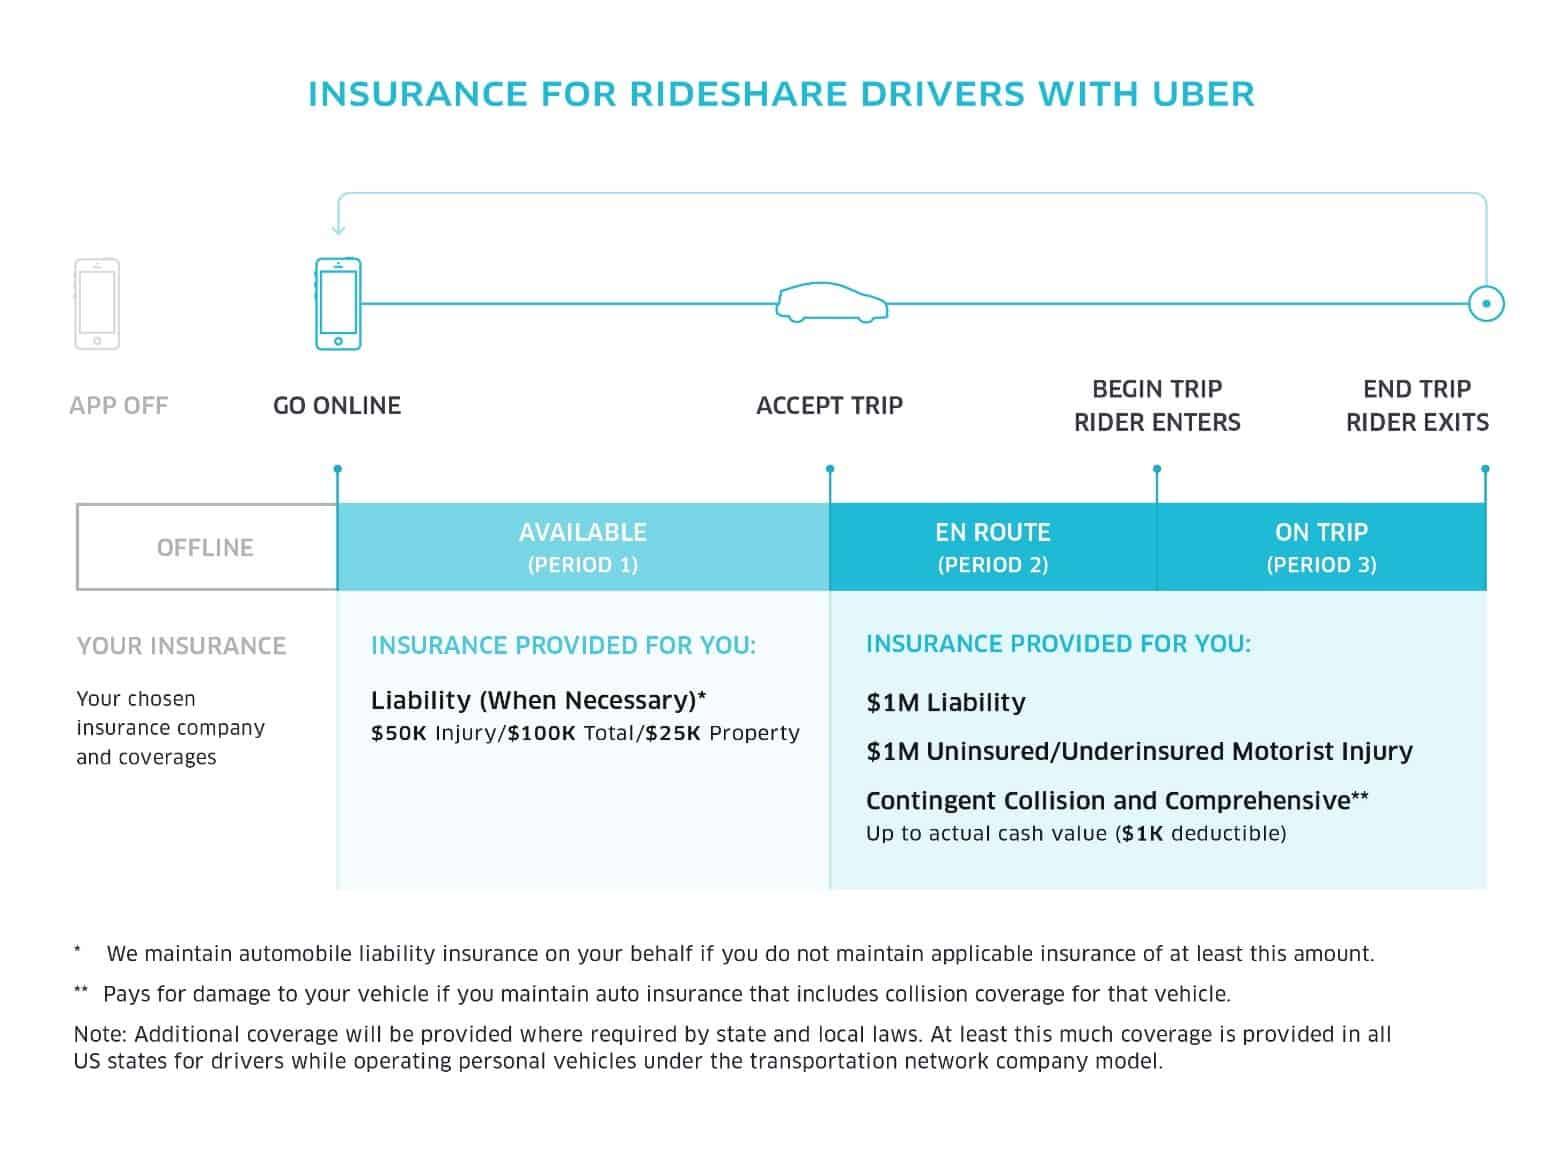 2015-11-01 JPEG of Uber coverage